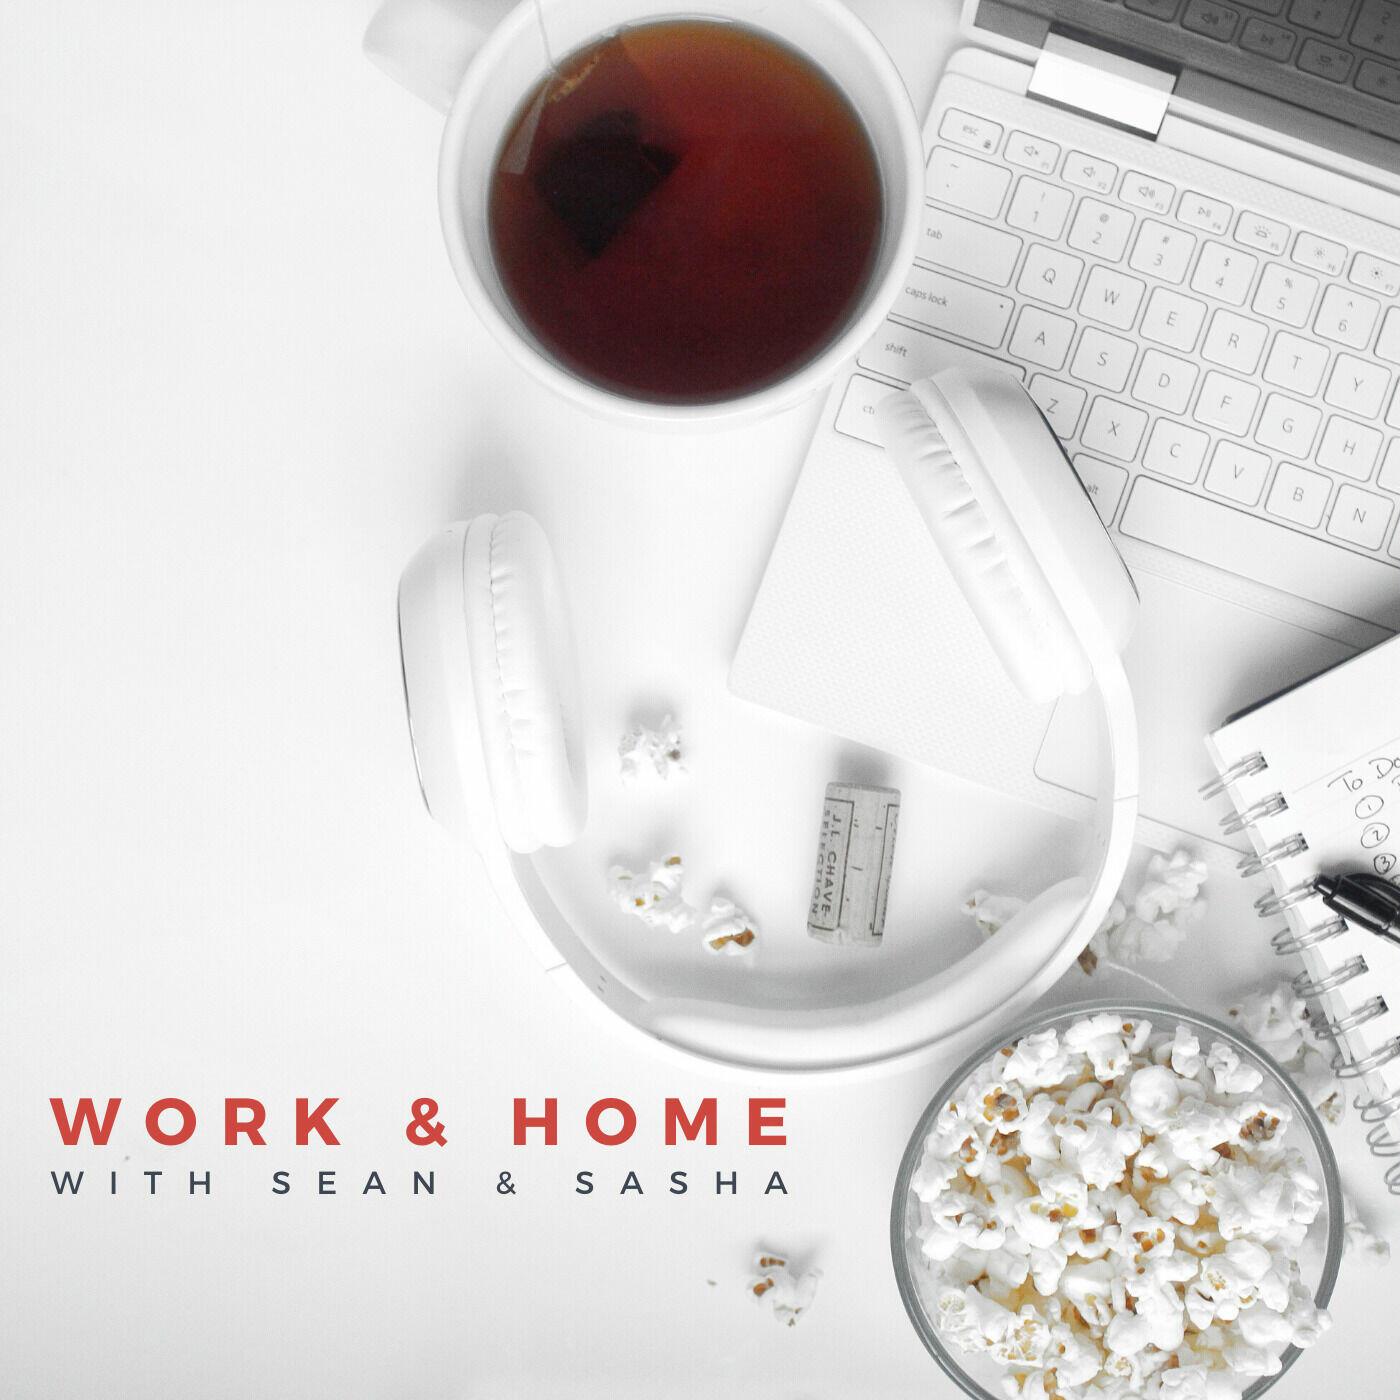 Work and Home with Sean & Sasha